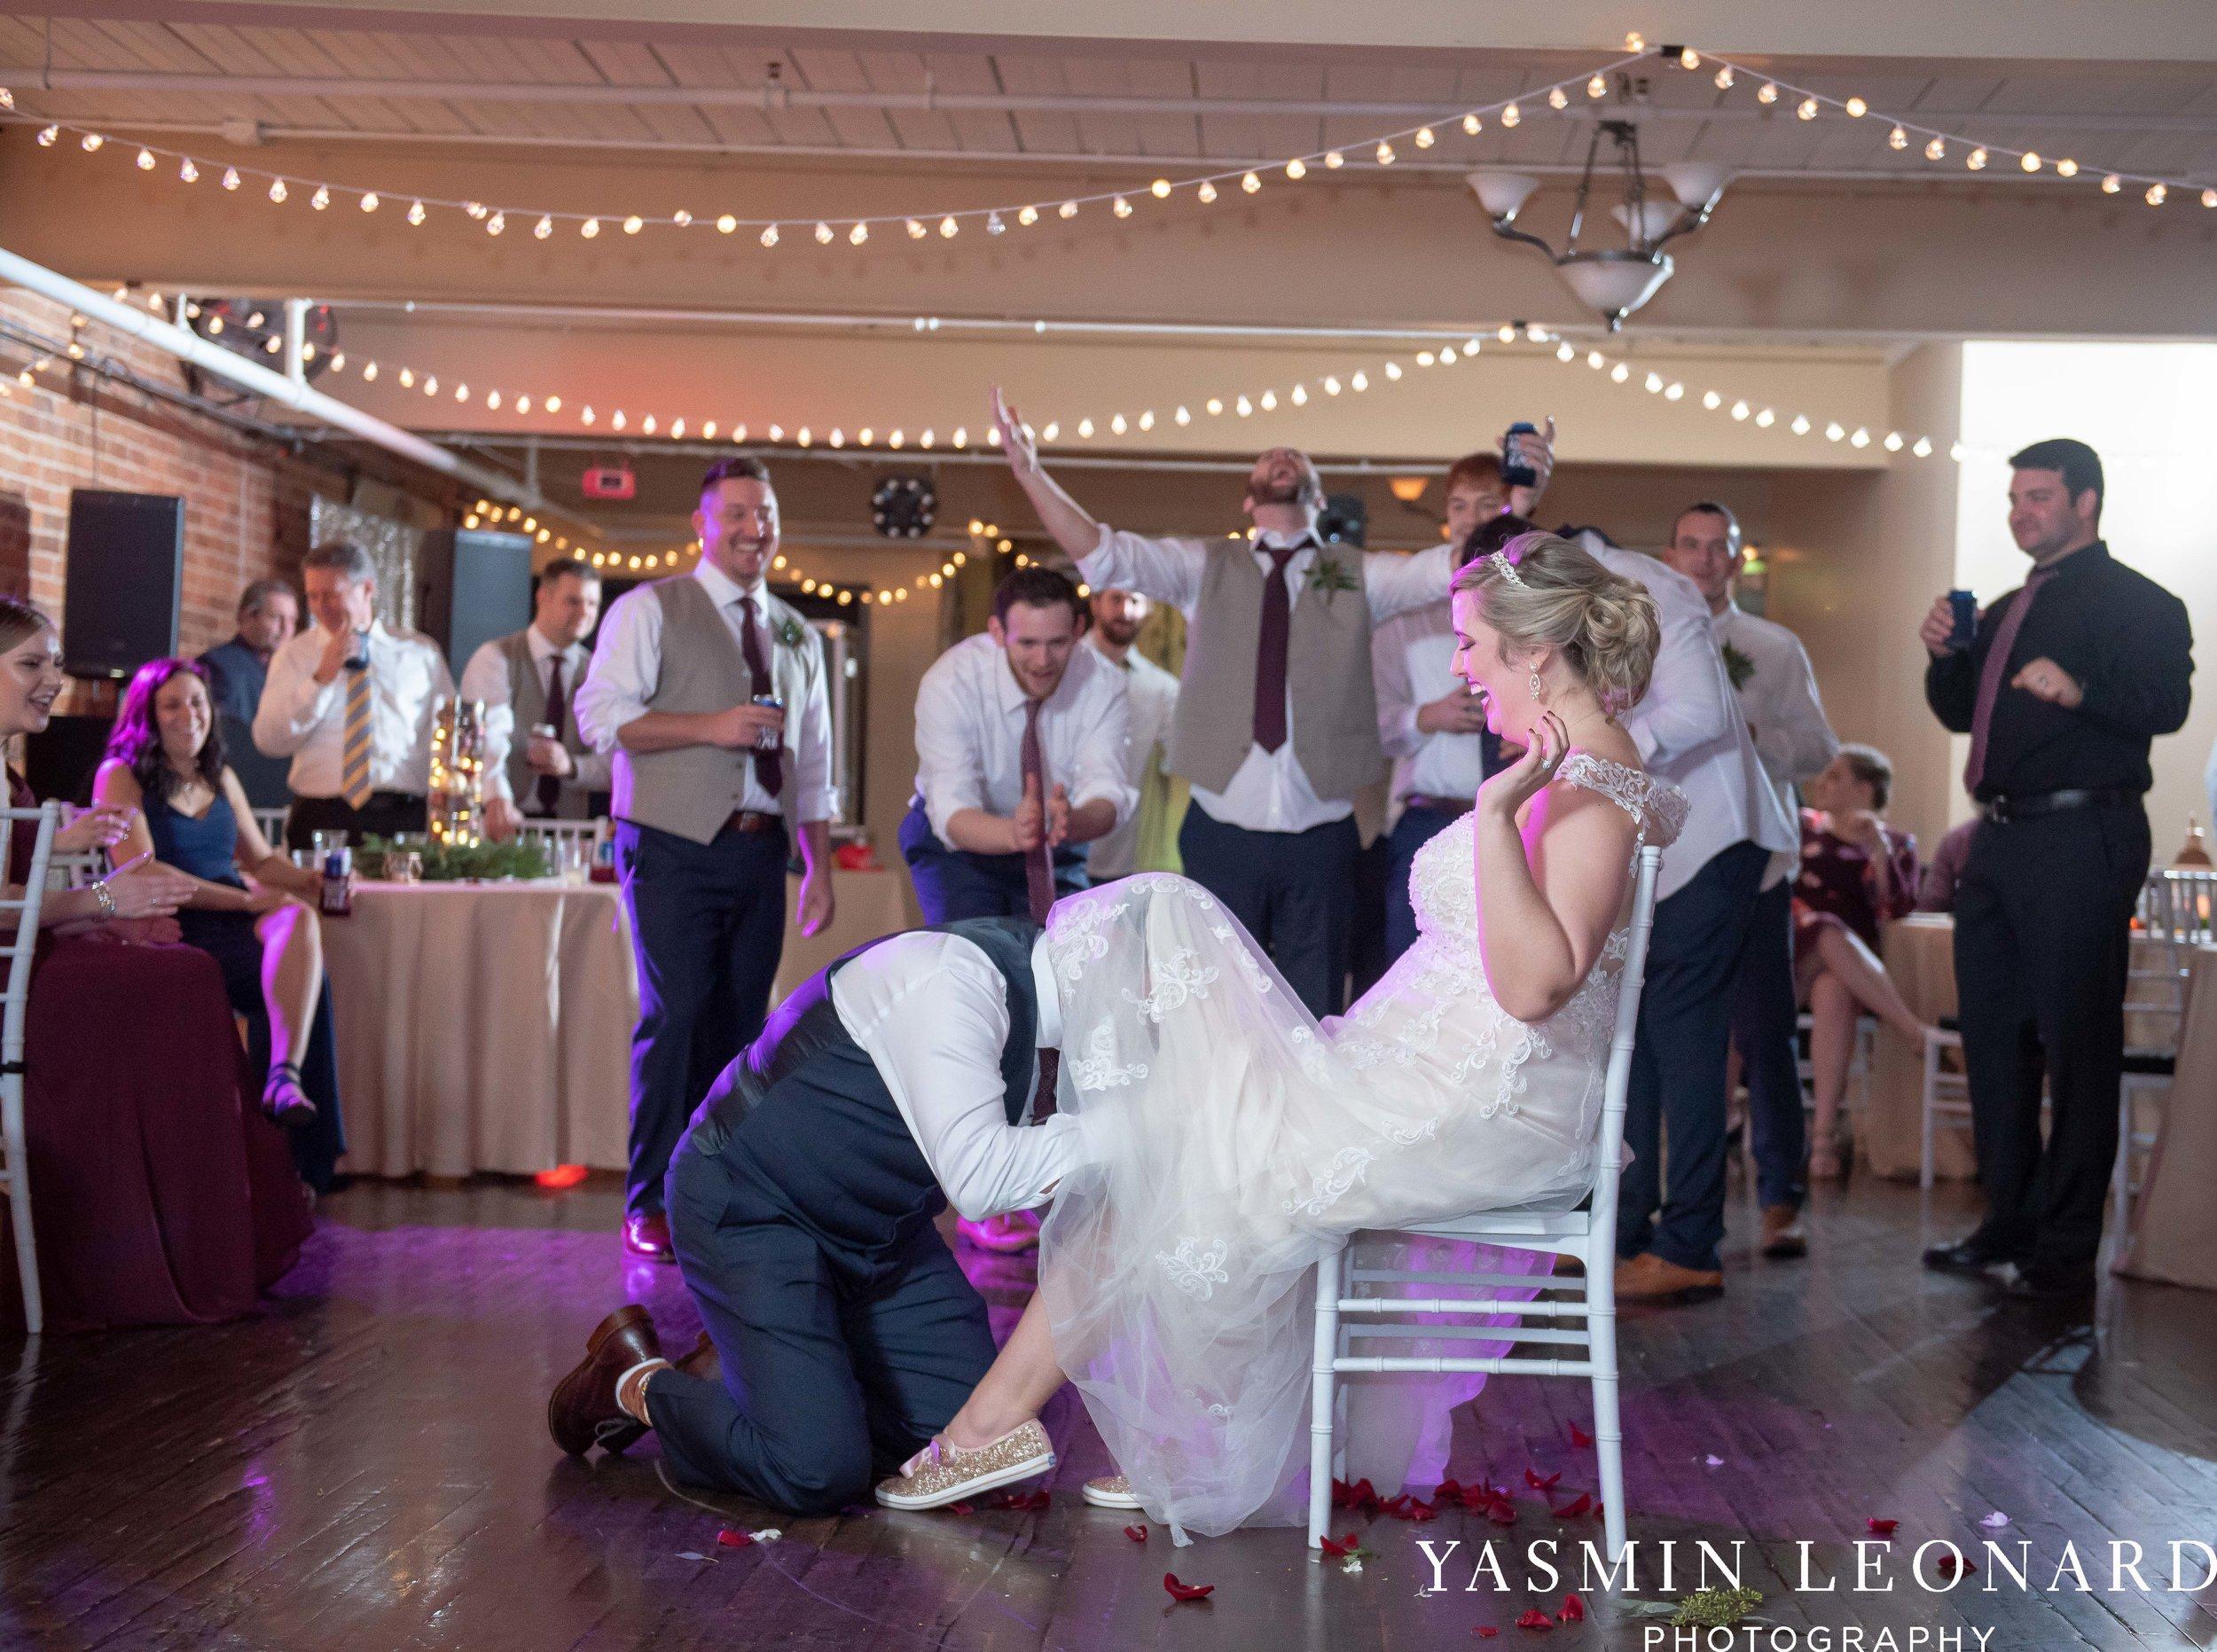 Rebekah and Matt - 105 Worth Event Centre - Yasmin Leonard Photography - Asheboro Wedding - NC Wedding - High Point Weddings - Triad Weddings - Winter Wedding-71.jpg